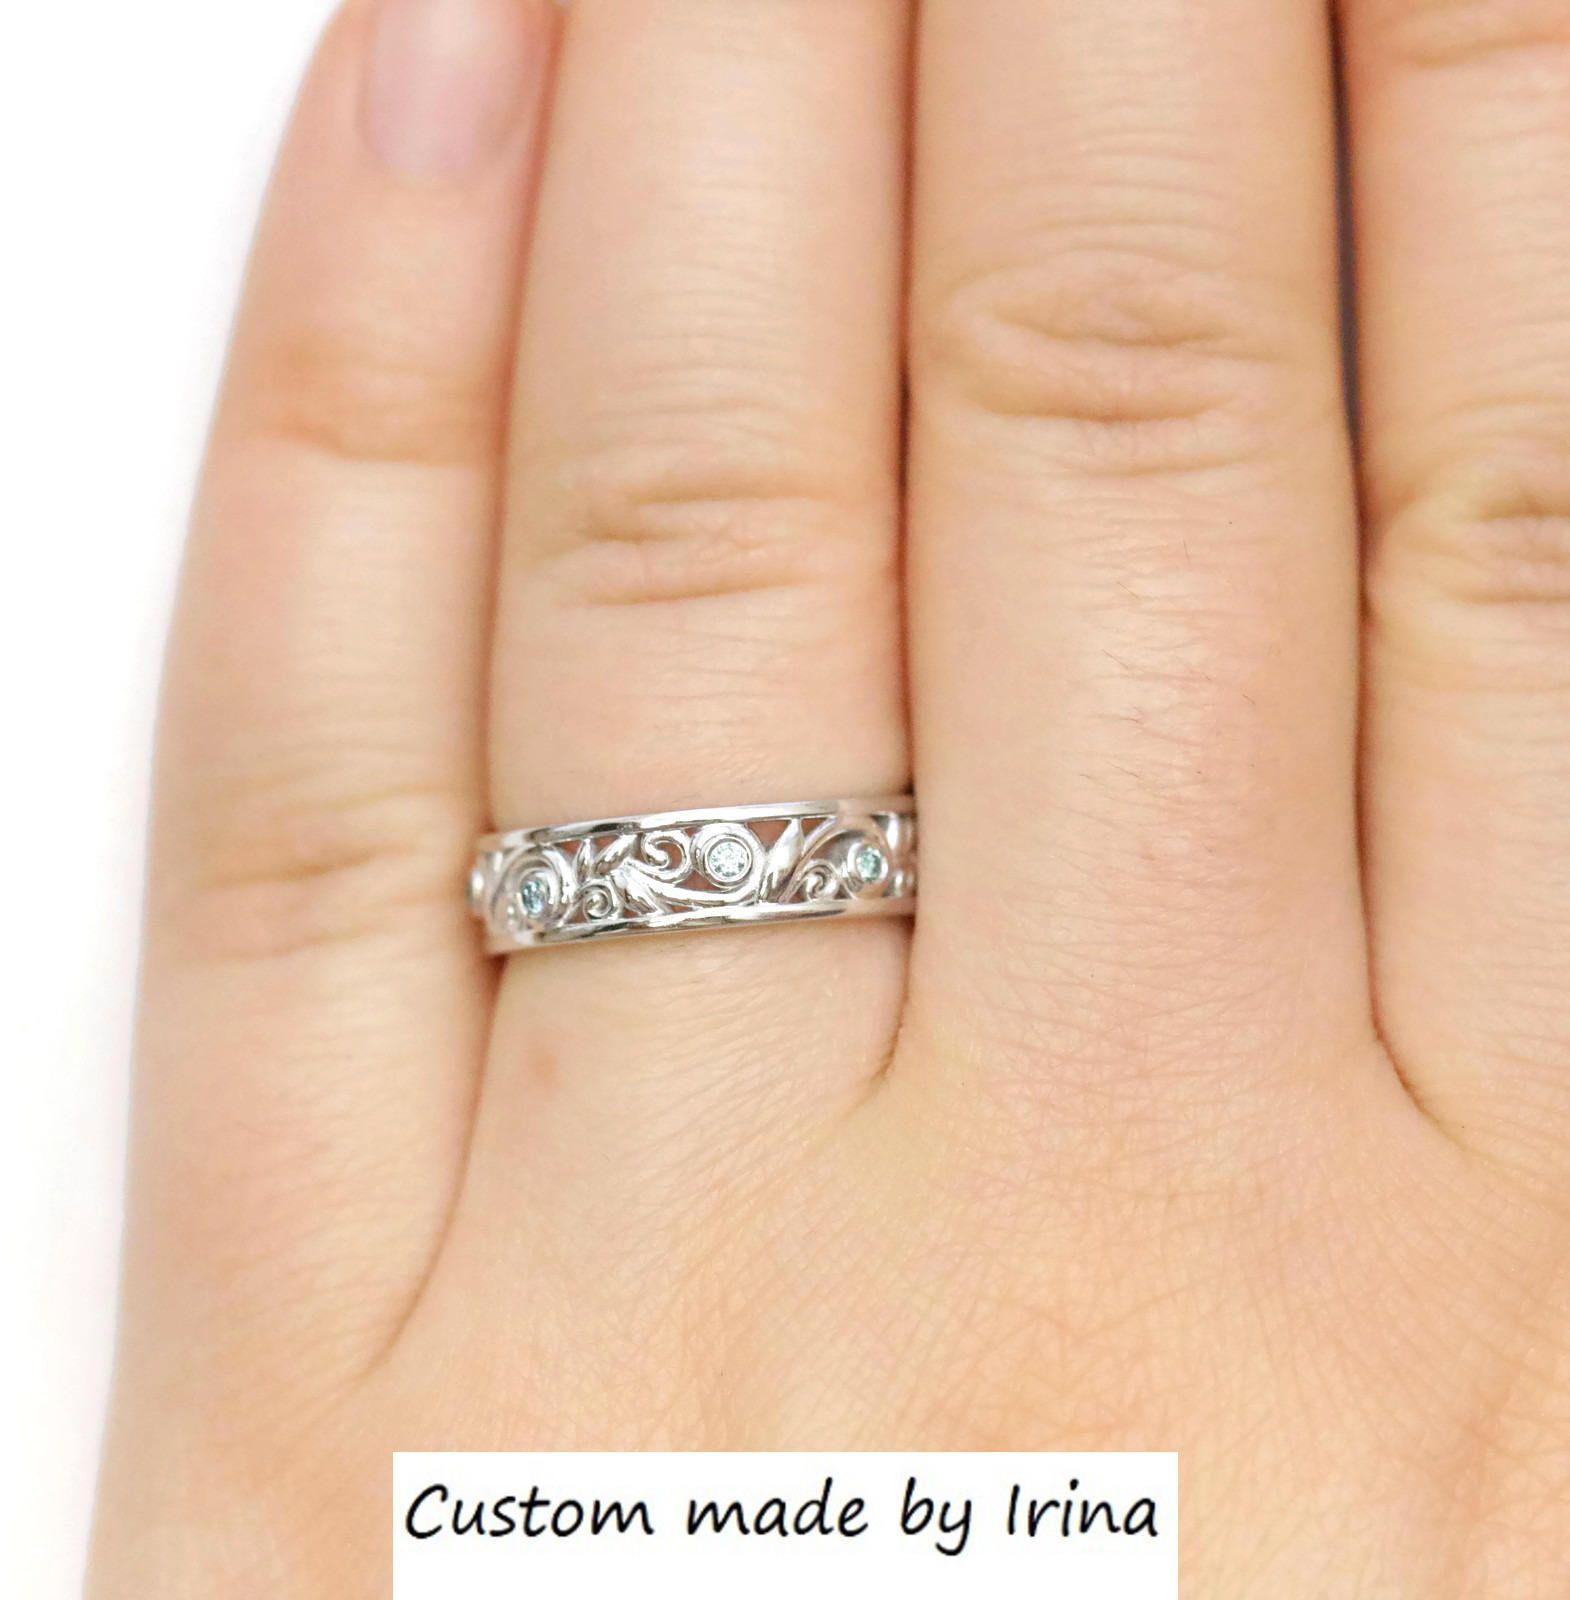 Rustic eternity wedding ring, teal blue diamond wedding